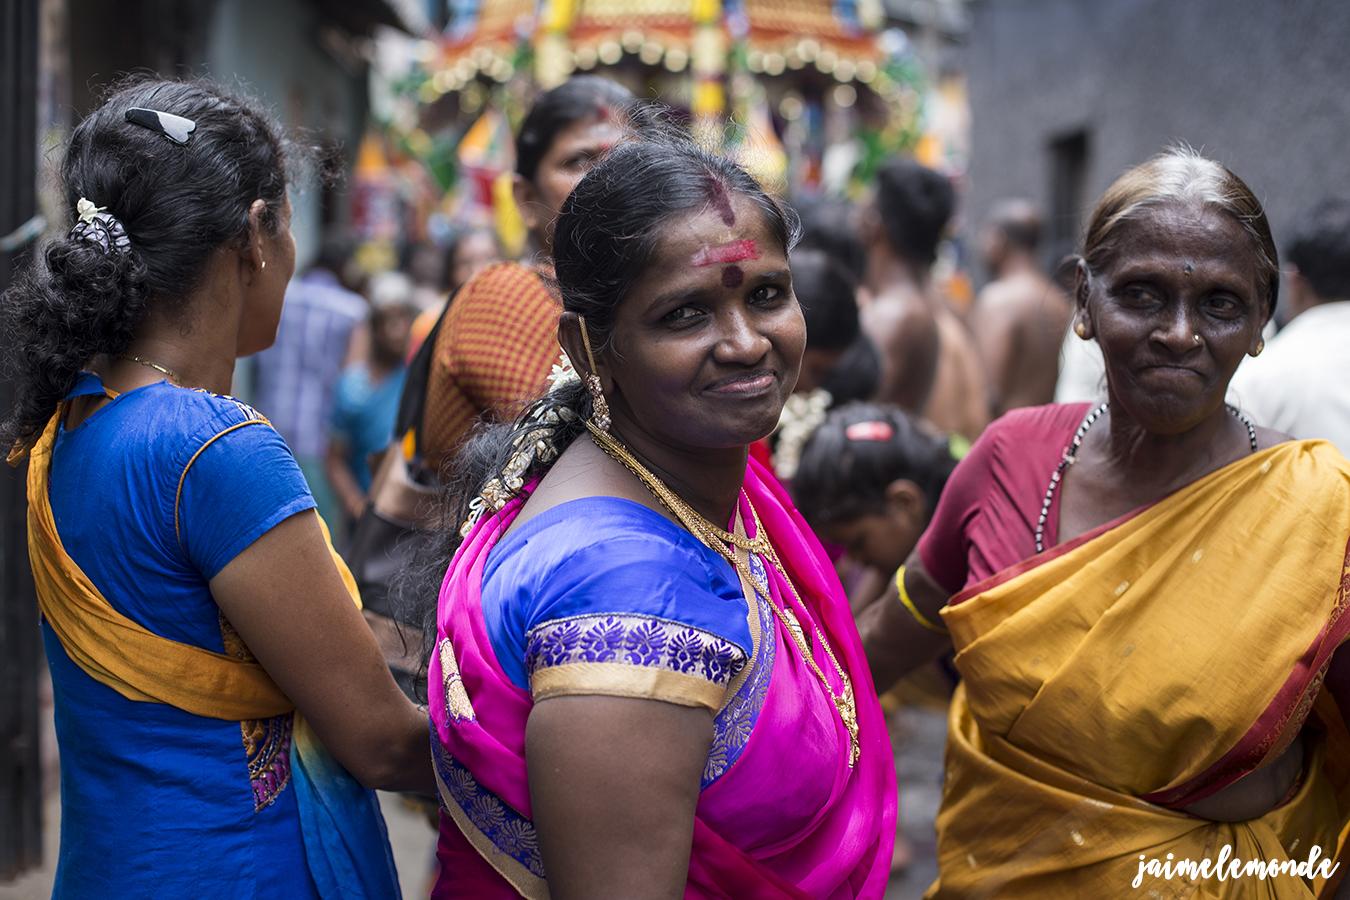 Portraits de voyage au Sri Lanka ©jaimelemonde (2)